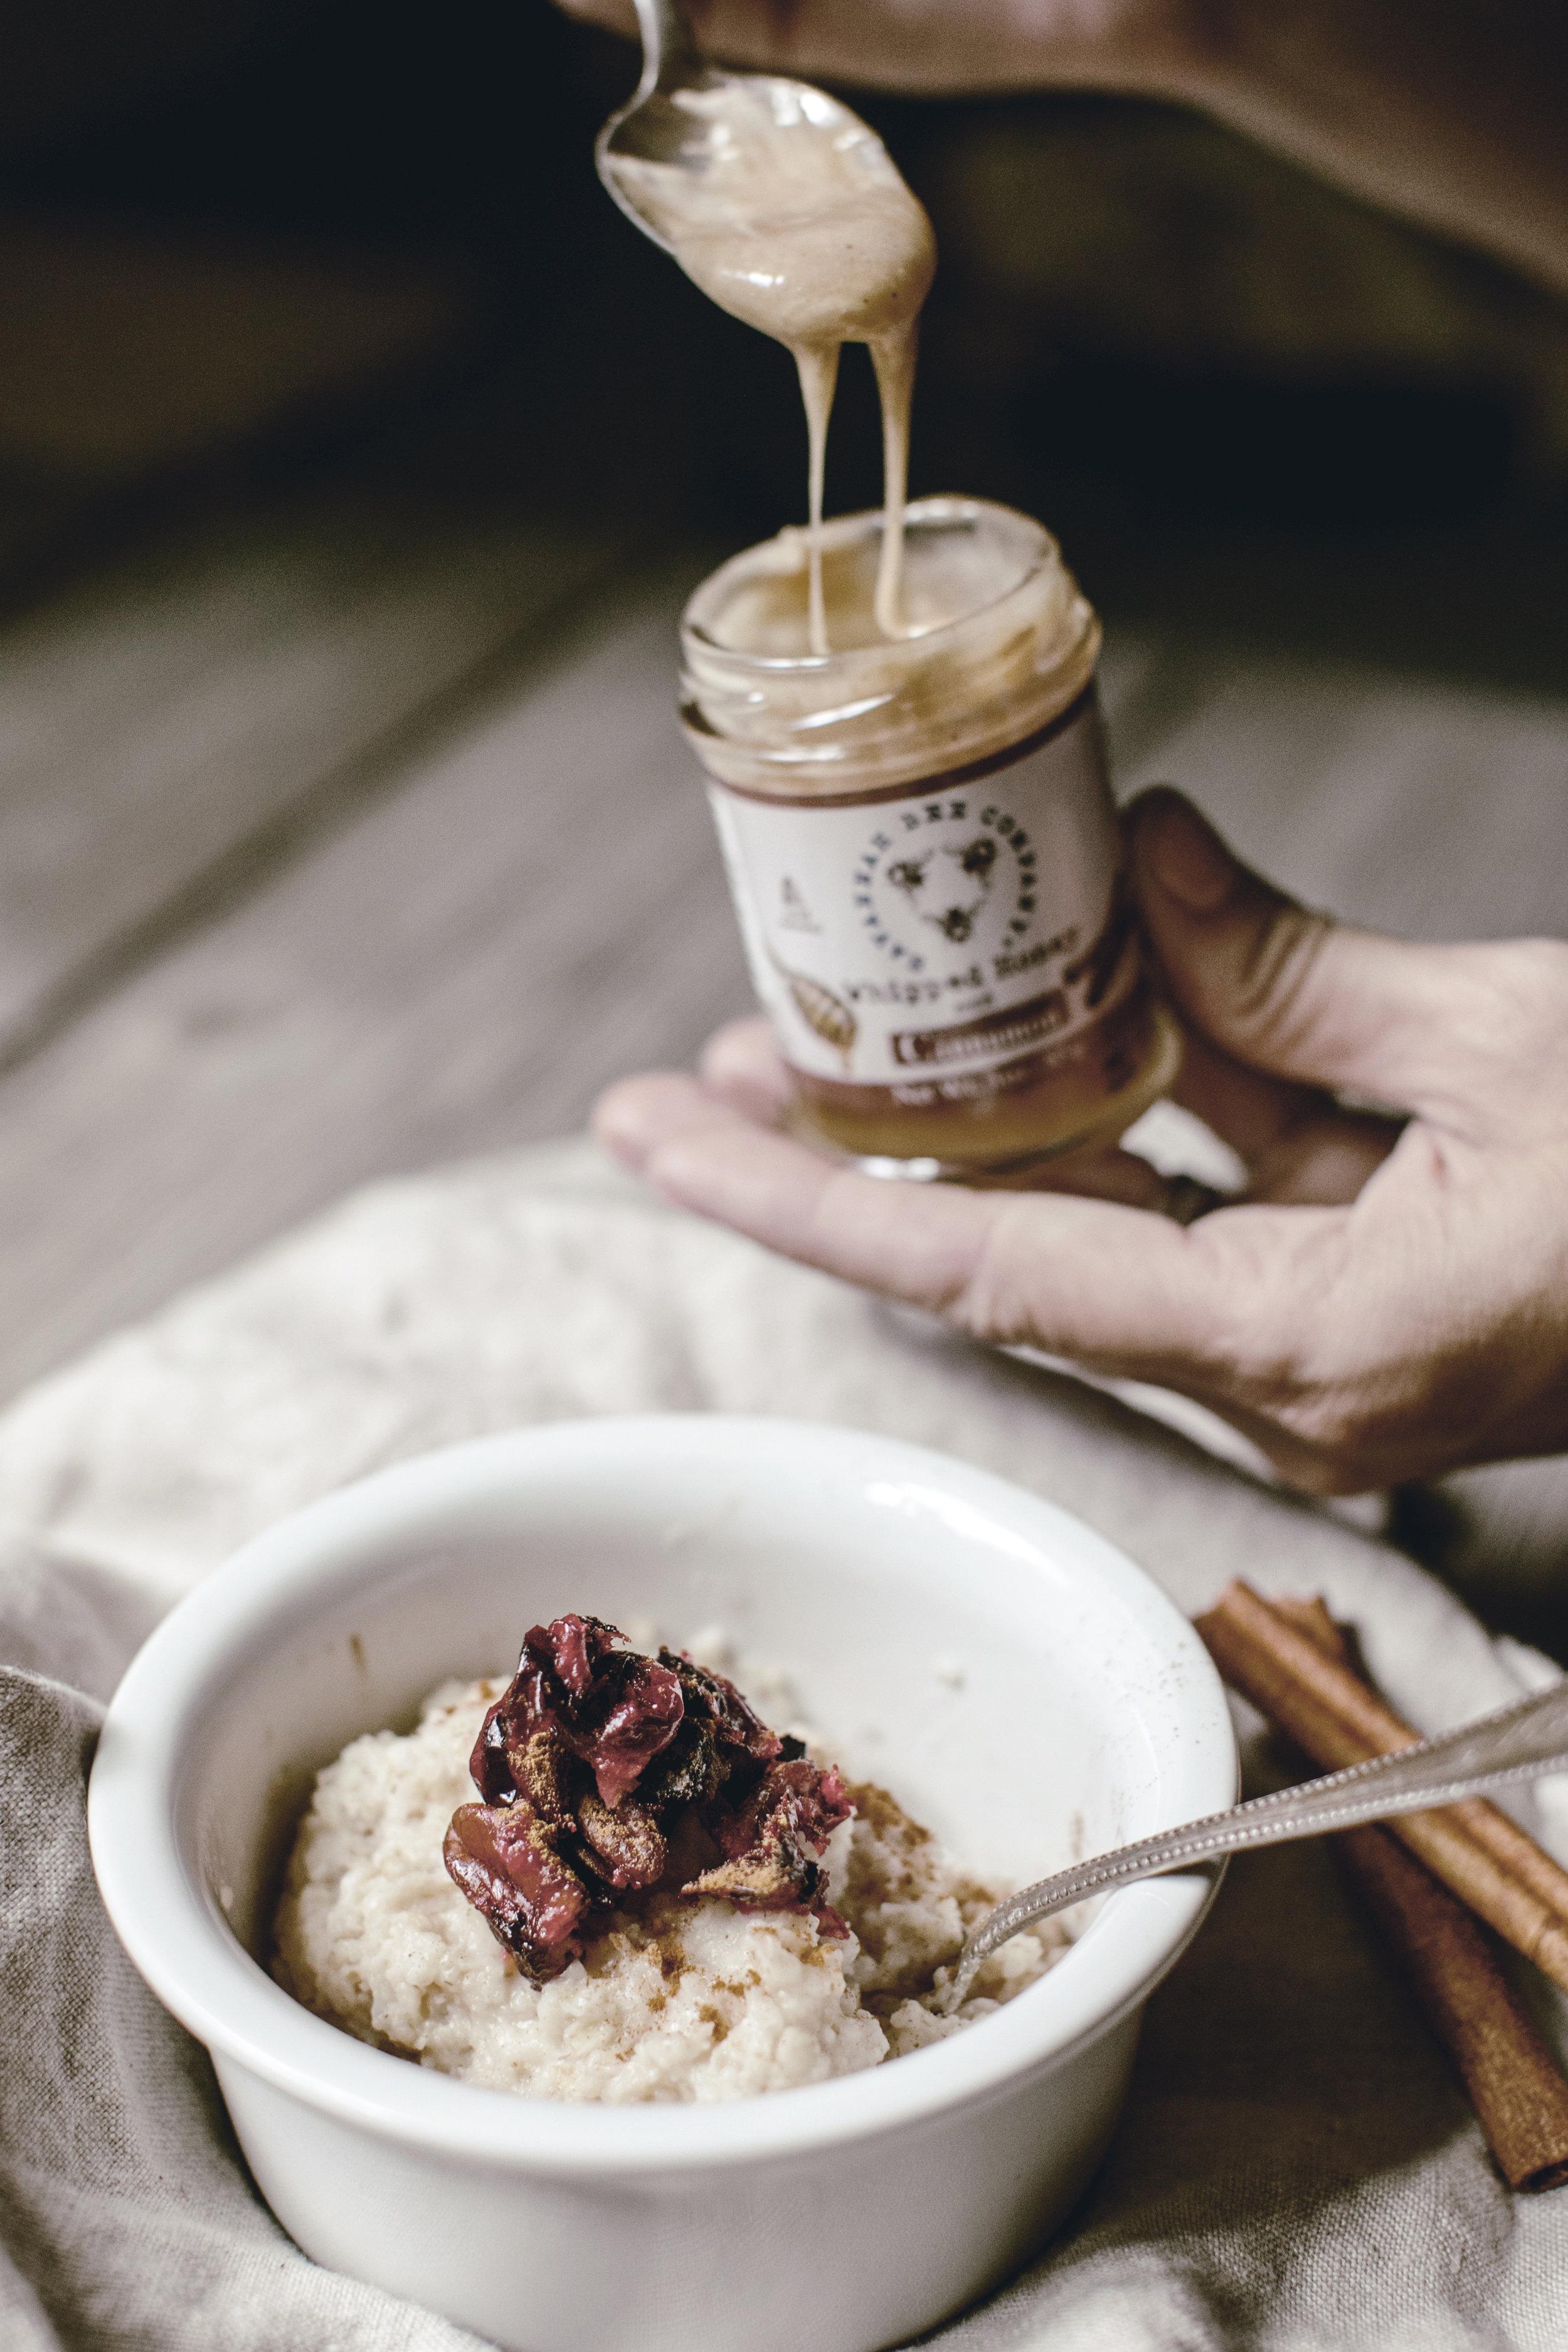 savannah bee co creamed honey with oatmeal / heirloomed